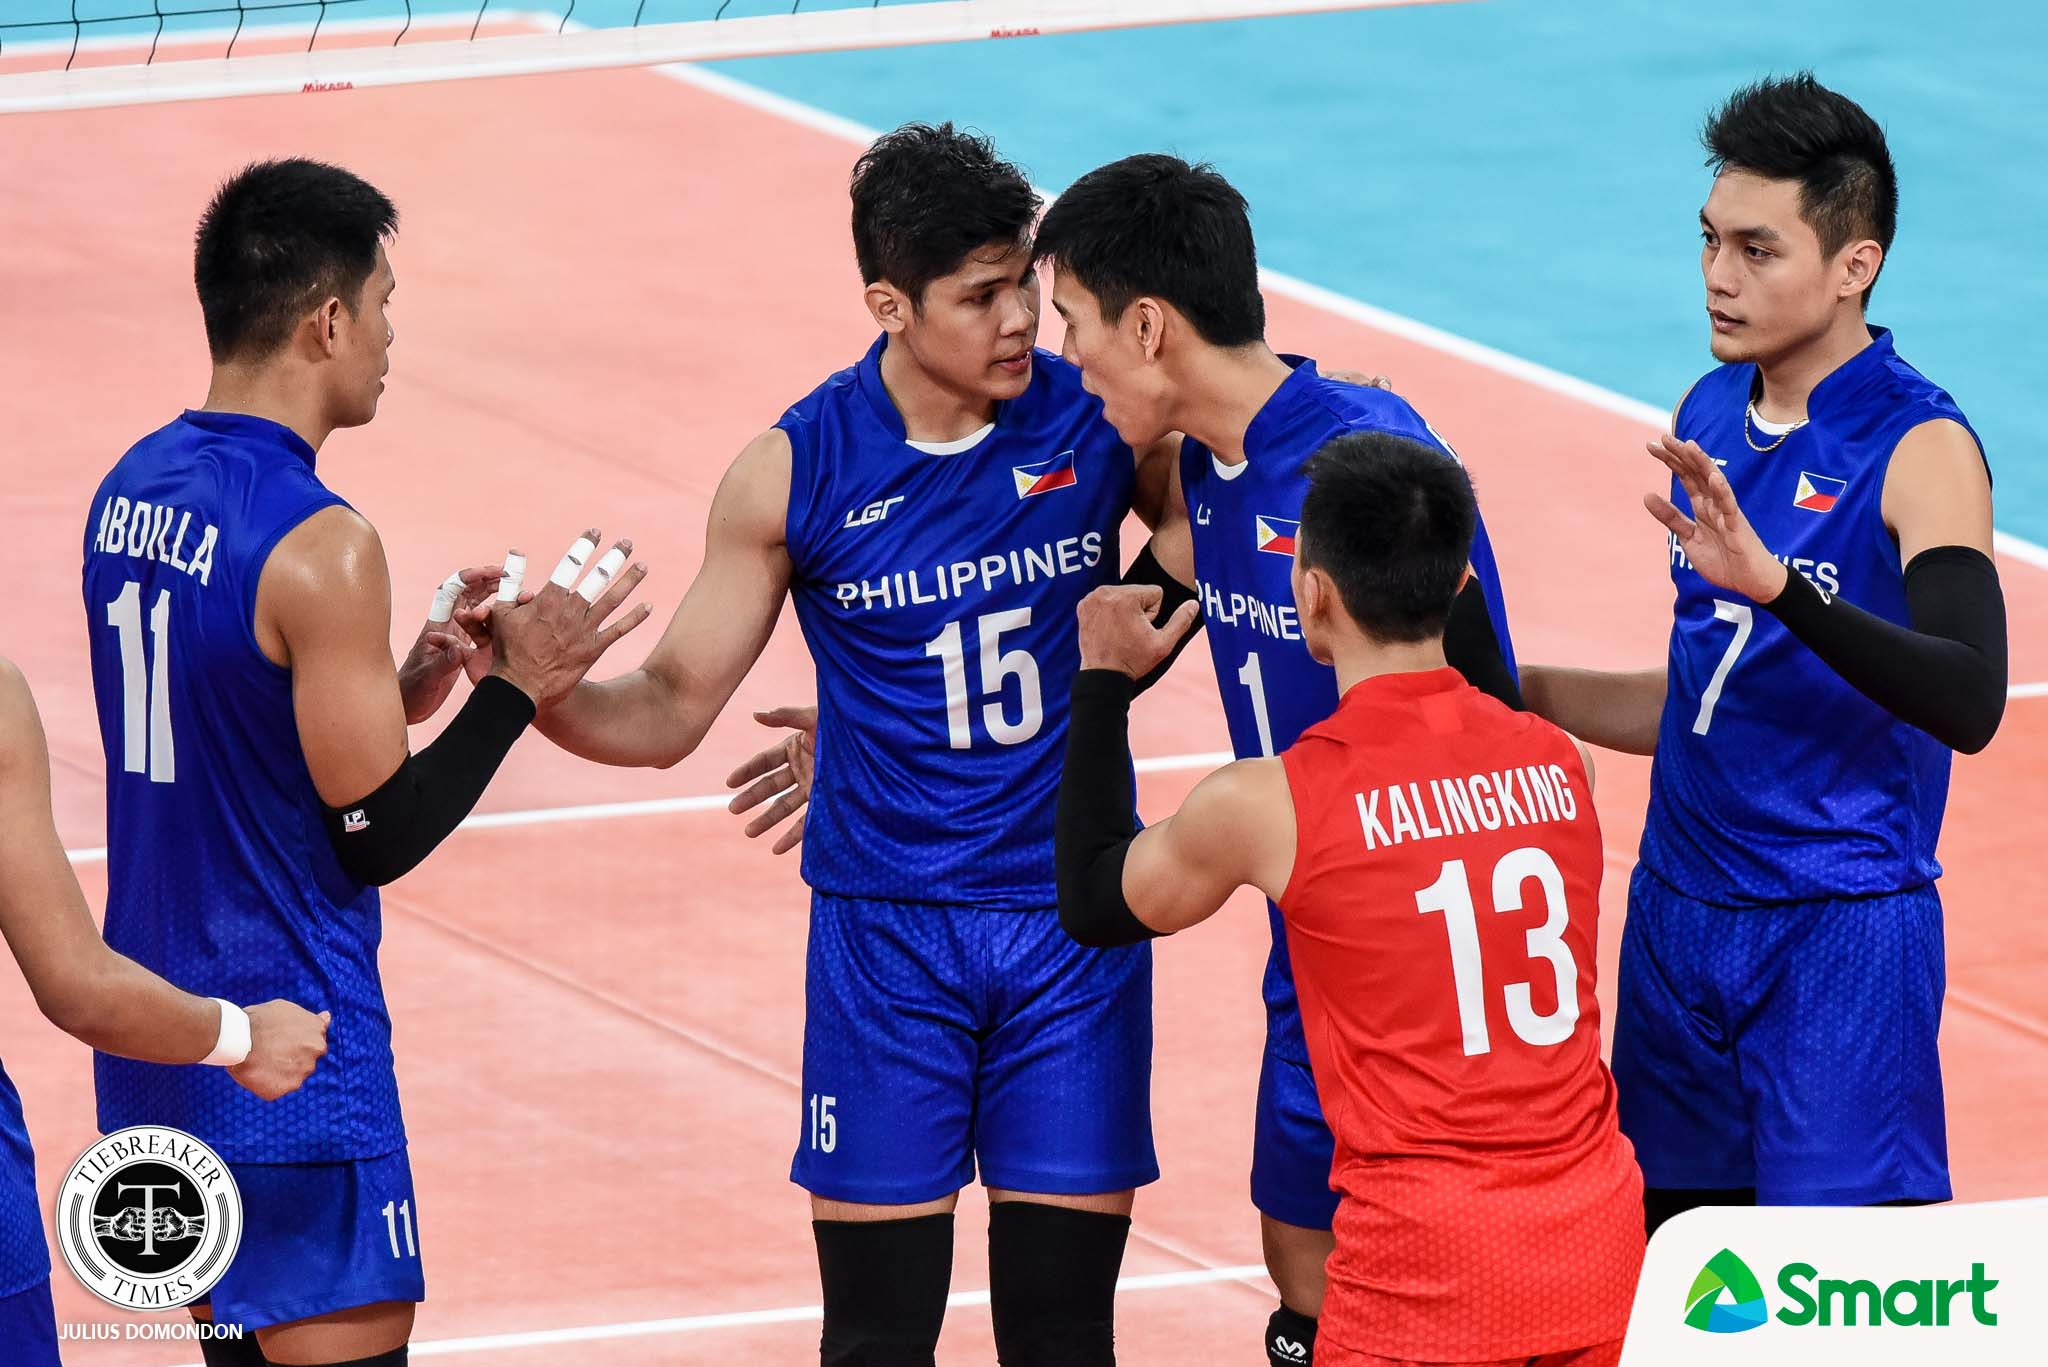 2019-SEA-Games-Philippines-vs-Vietnam-Marck-Espejo-x-Bryan-Bagunas Alinsunurin expects this trio to fill void left by Espejo, Bagunas News Volleyball  - philippine sports news